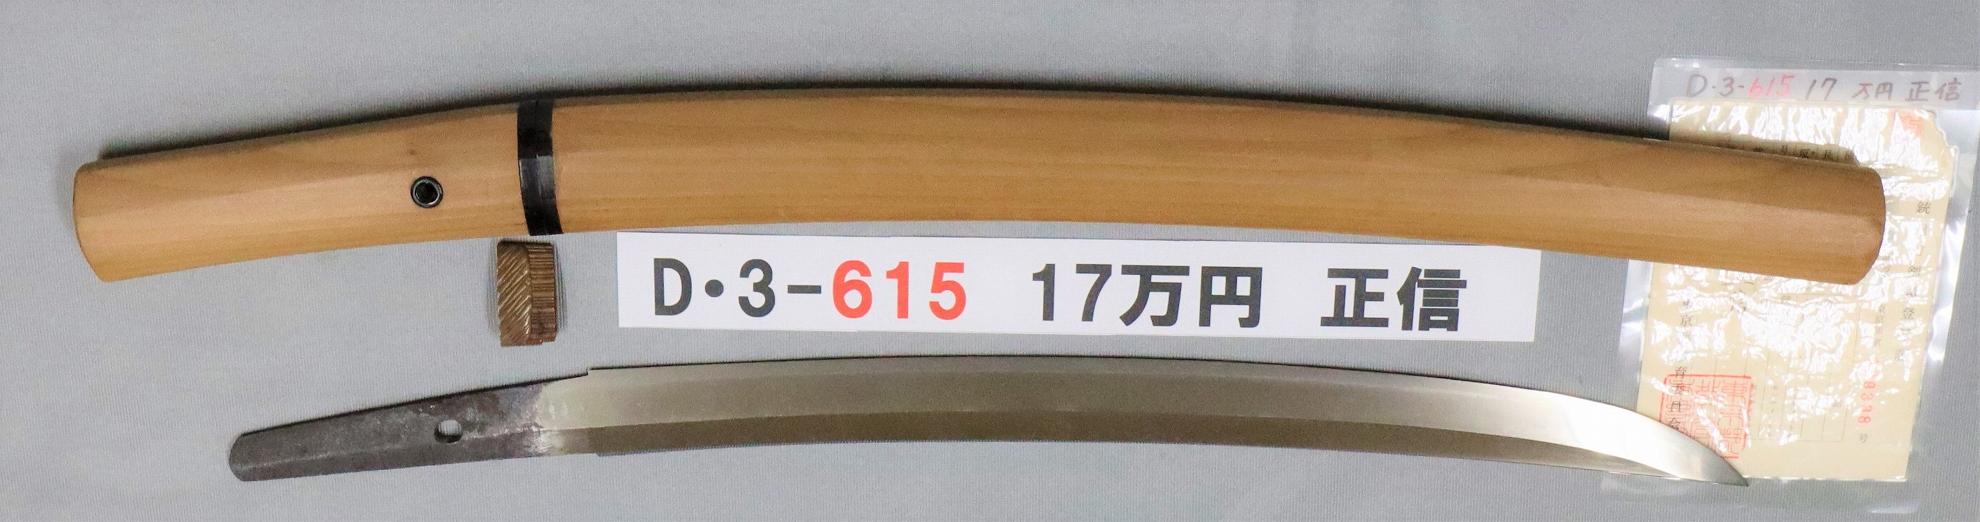 D3615